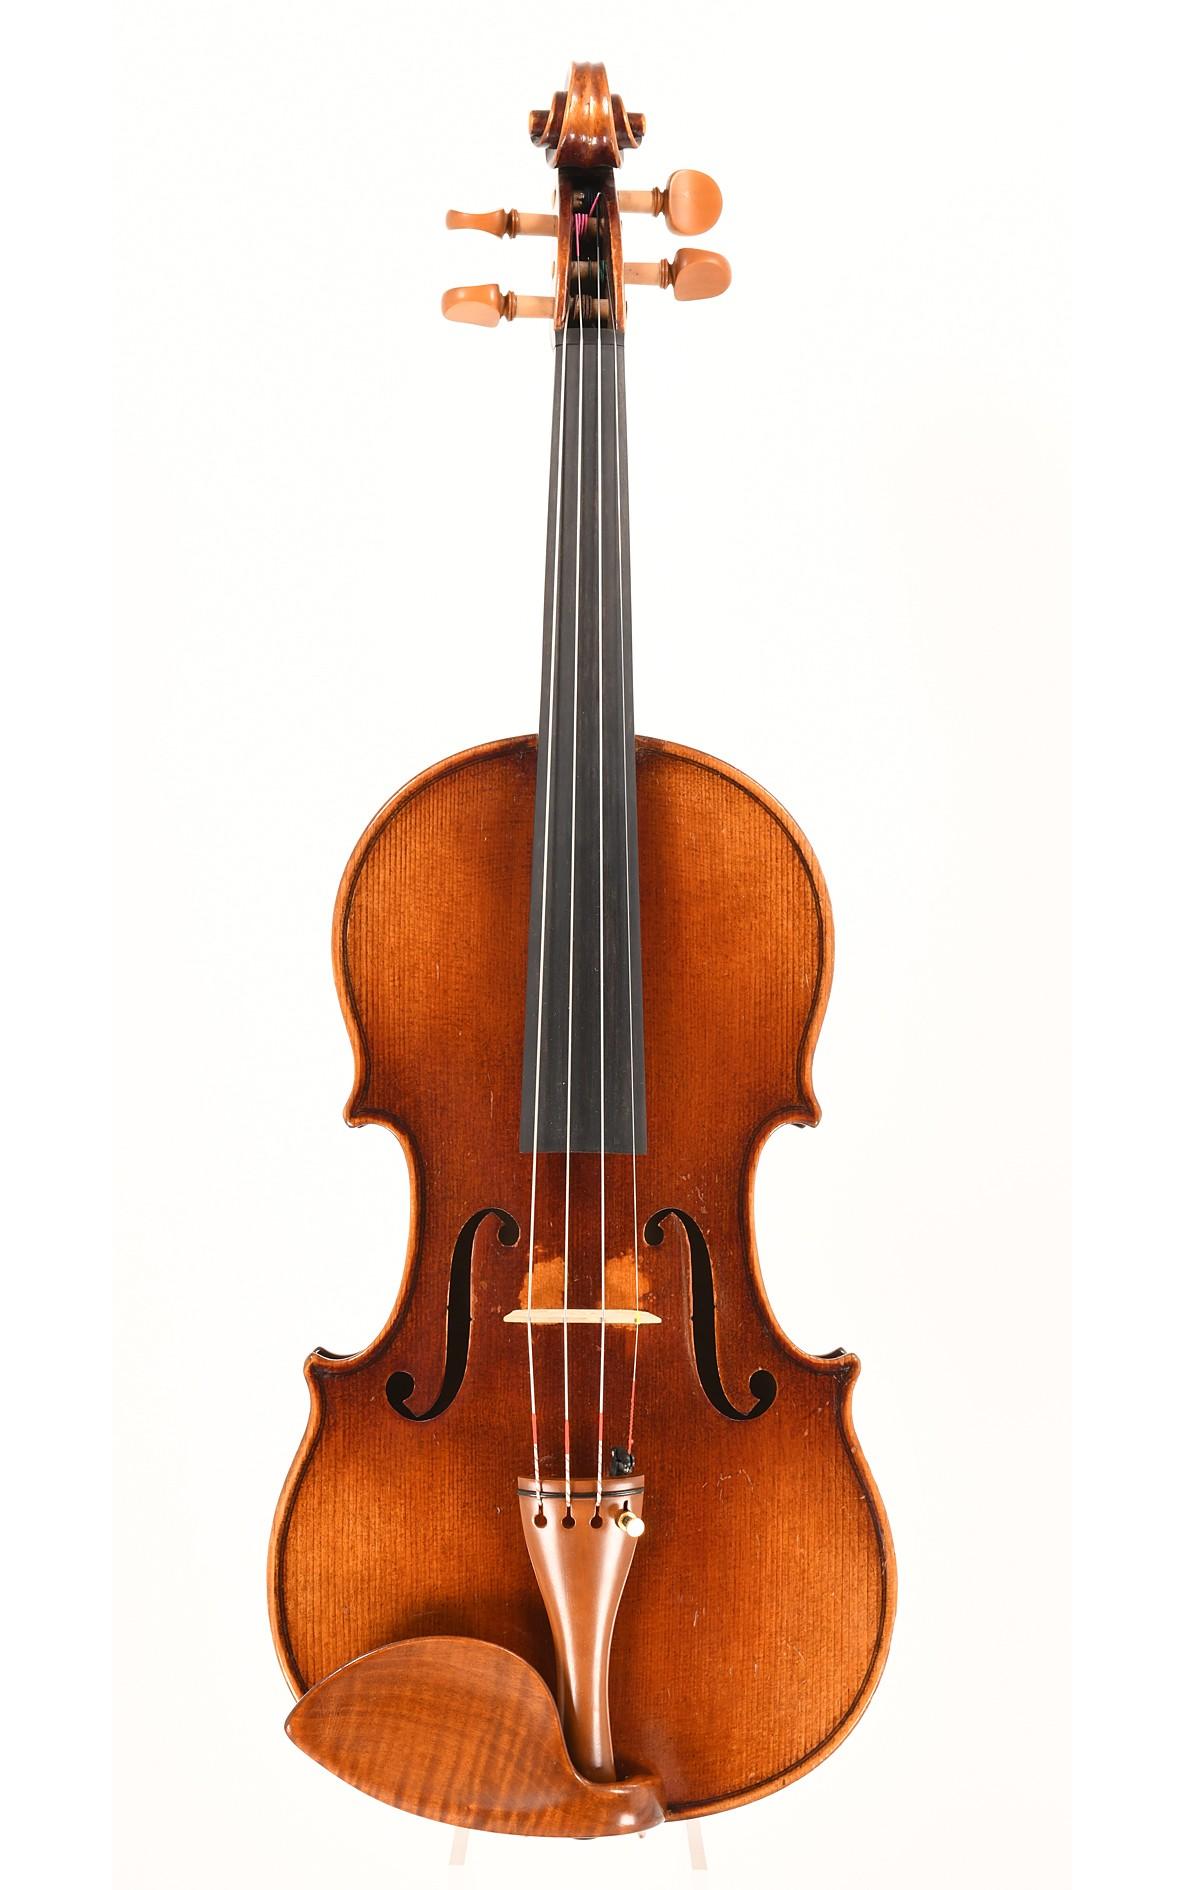 Handcrafted Markneukirchen violin - top